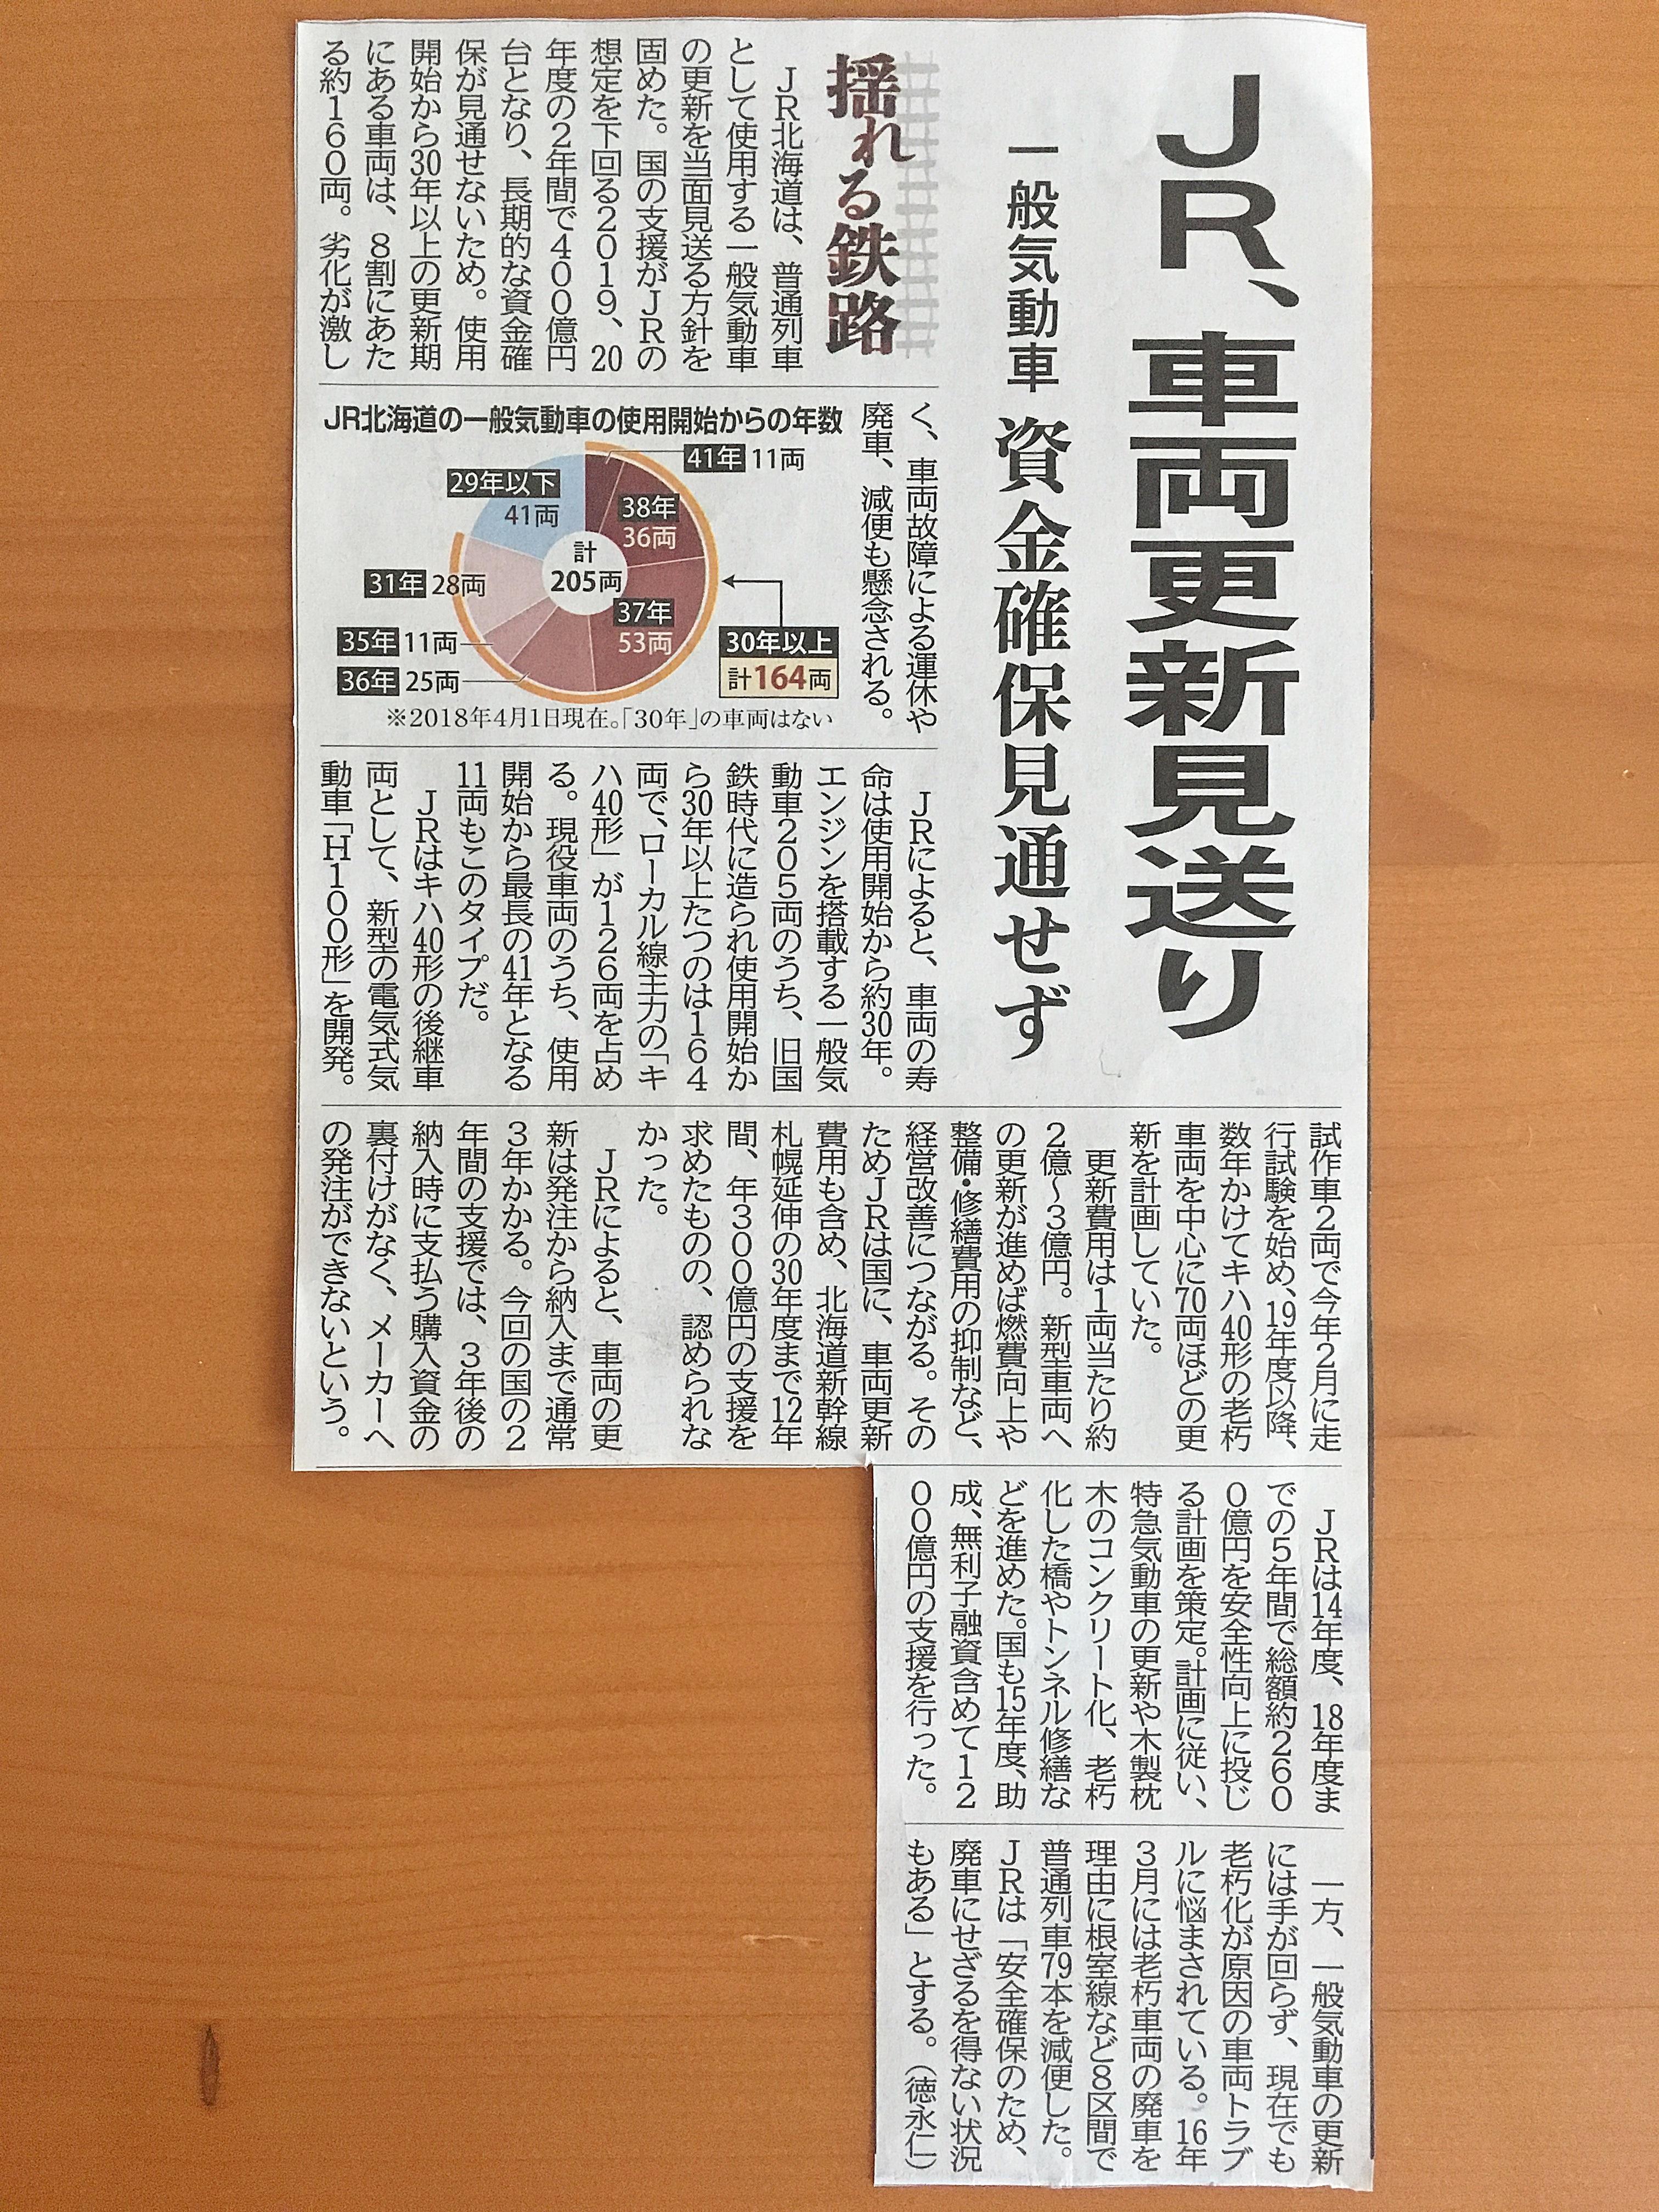 JR北海道車両更新見送り記事_180804.JPG